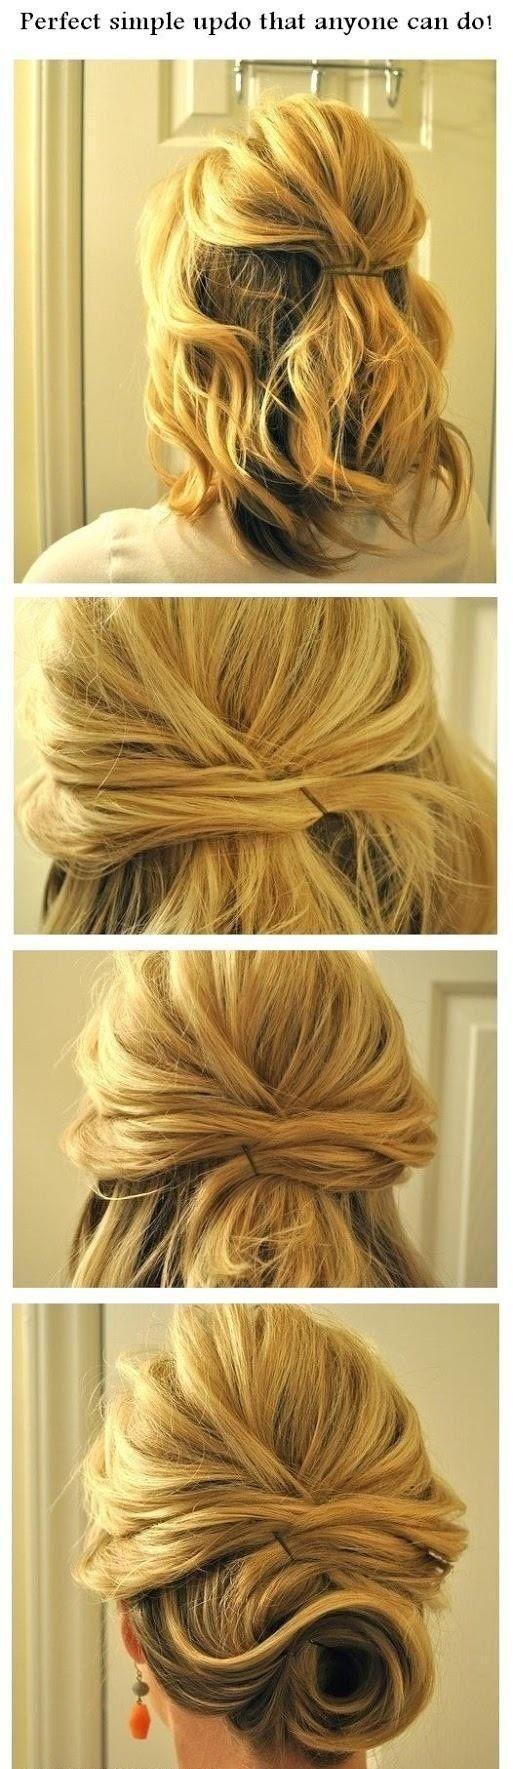 Amazing 15 Cute Easy Hairstyle Tutorials For Medium Length Hair Gurl Com Short Hairstyles Gunalazisus